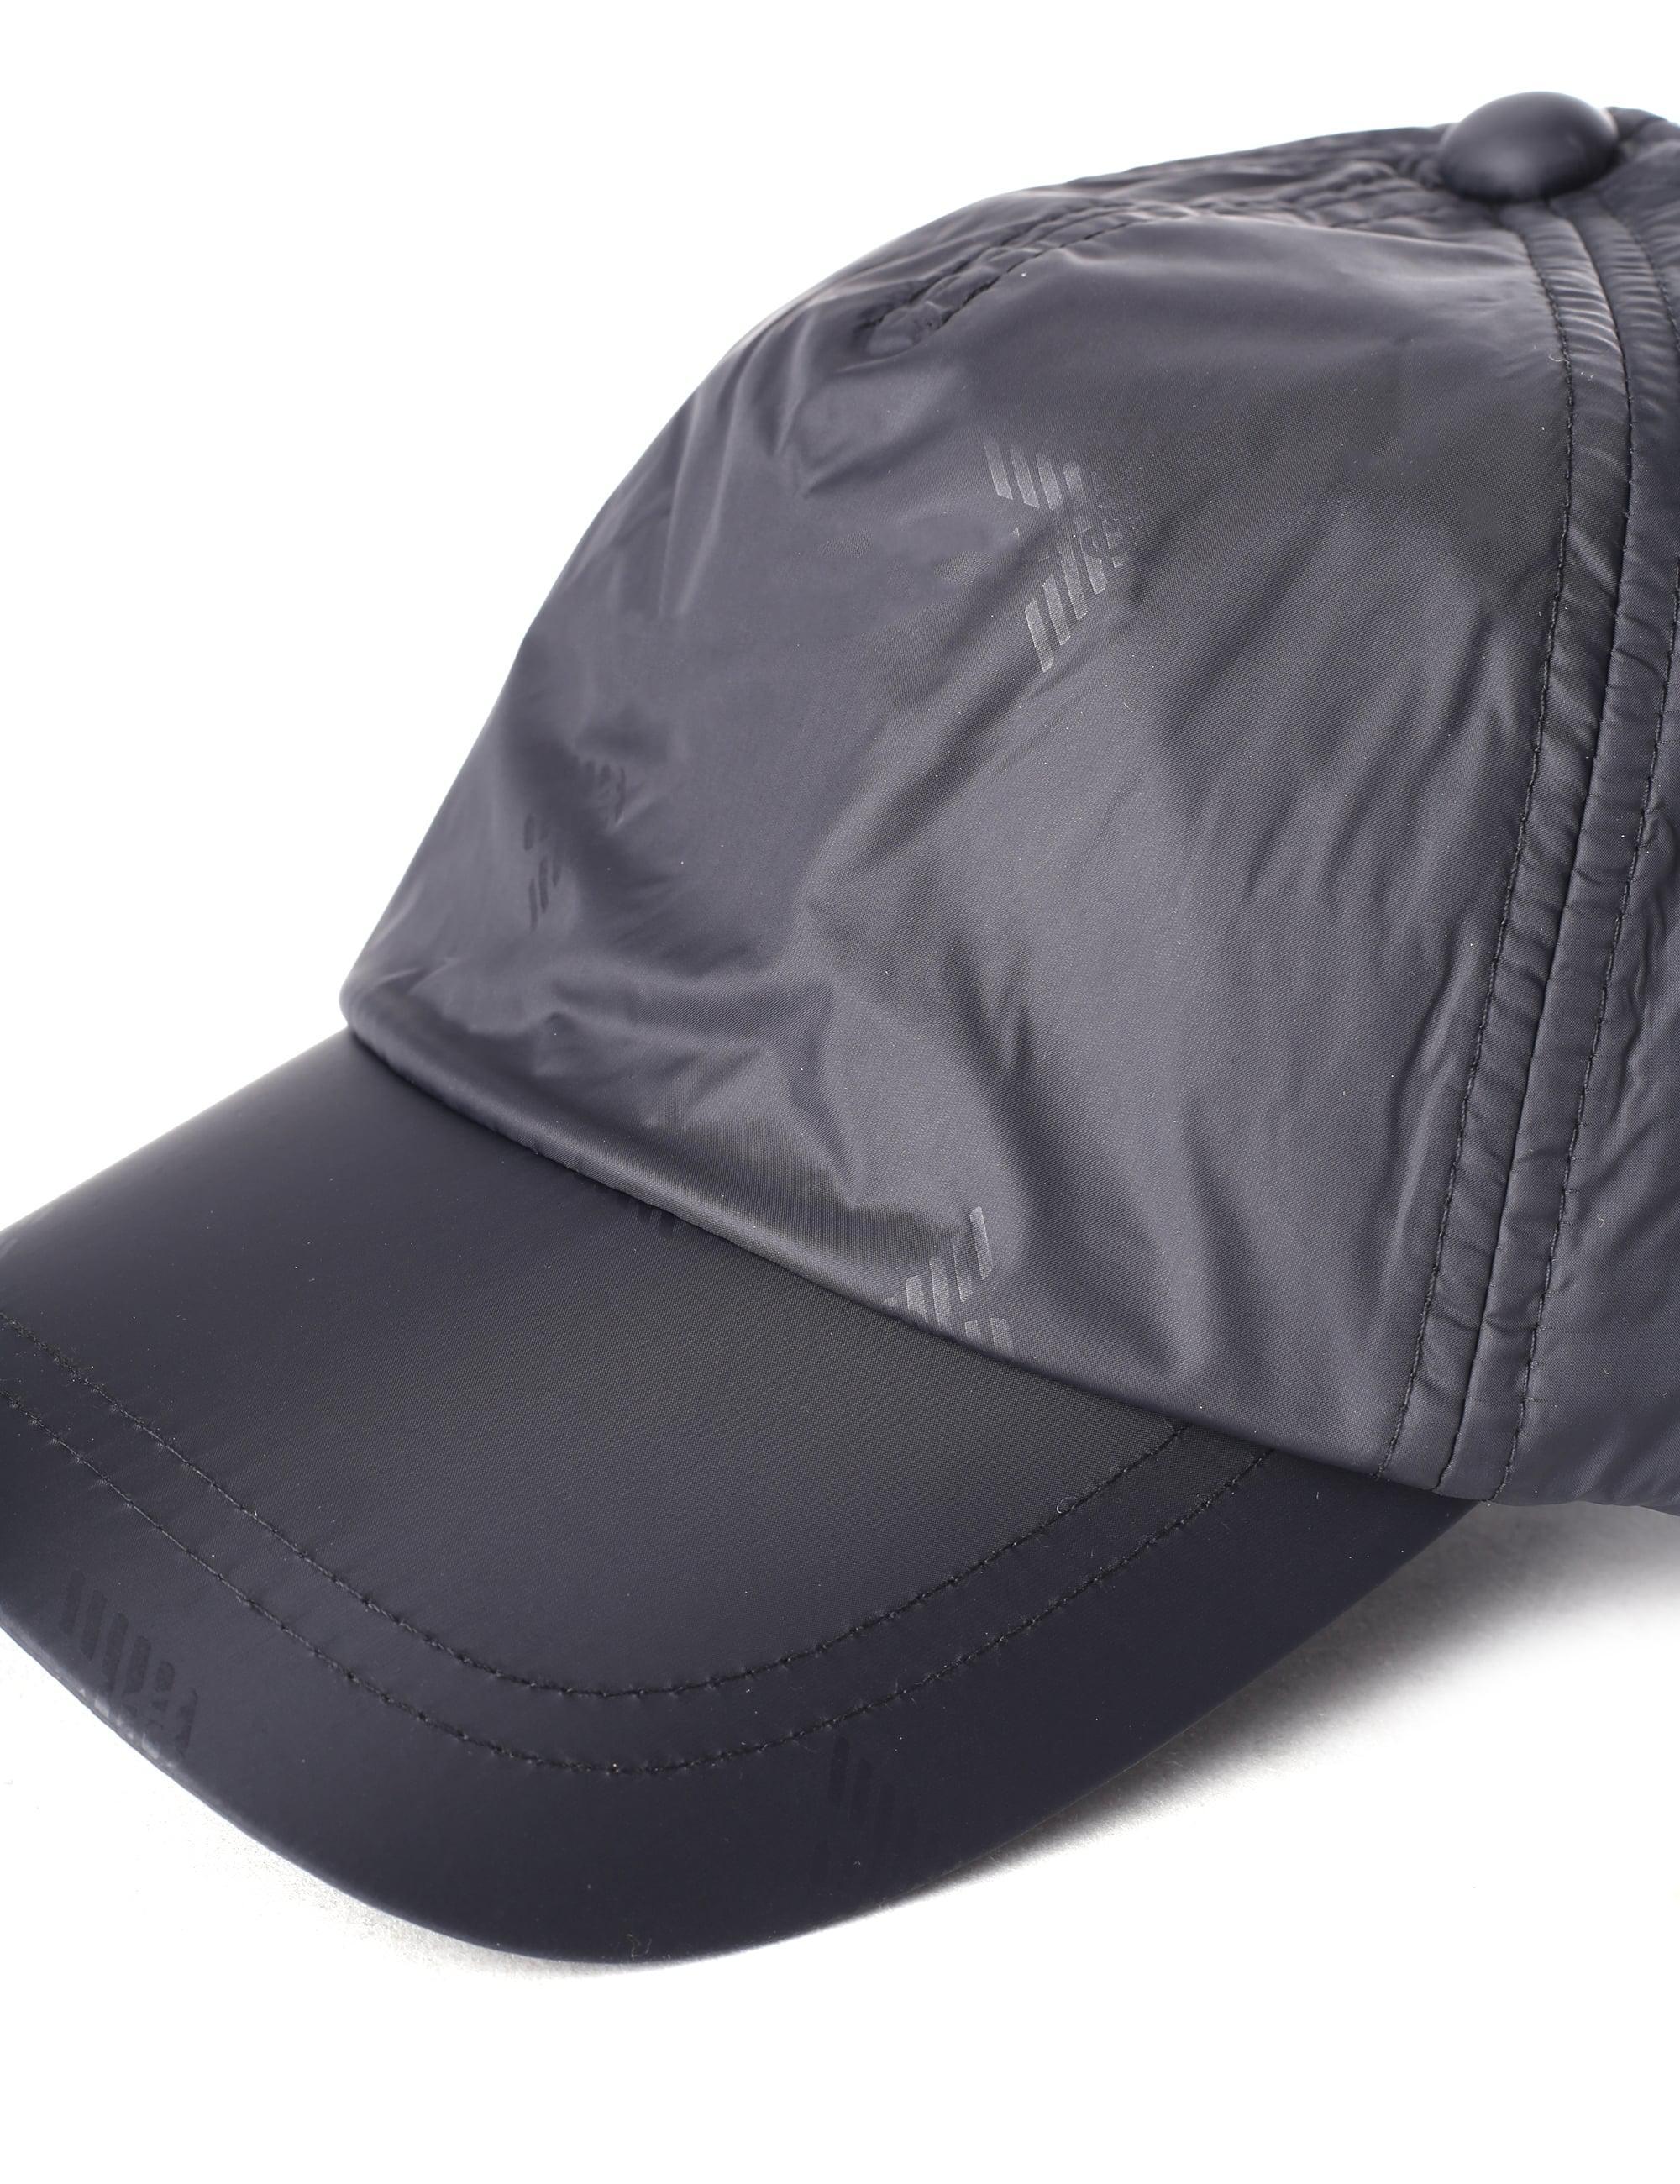 370d46c60 Emporio Armani - Men's Repeat Logo Baseball Cap Black for Men - Lyst. View  fullscreen